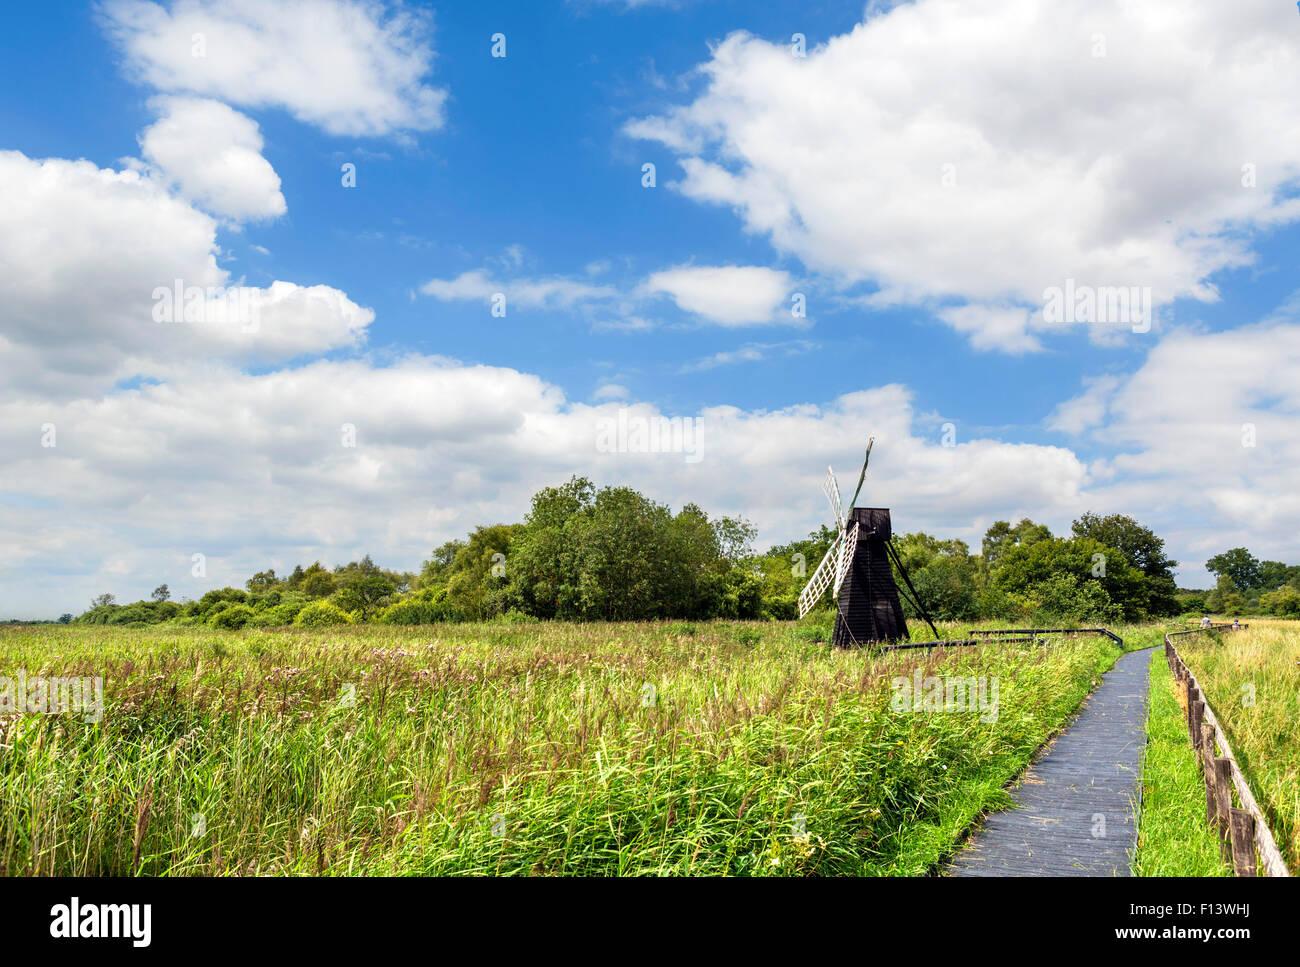 Trail through Wicken Fen, a wetland nature reserve near Wicken, Cambridgeshire, England, UK Stock Photo